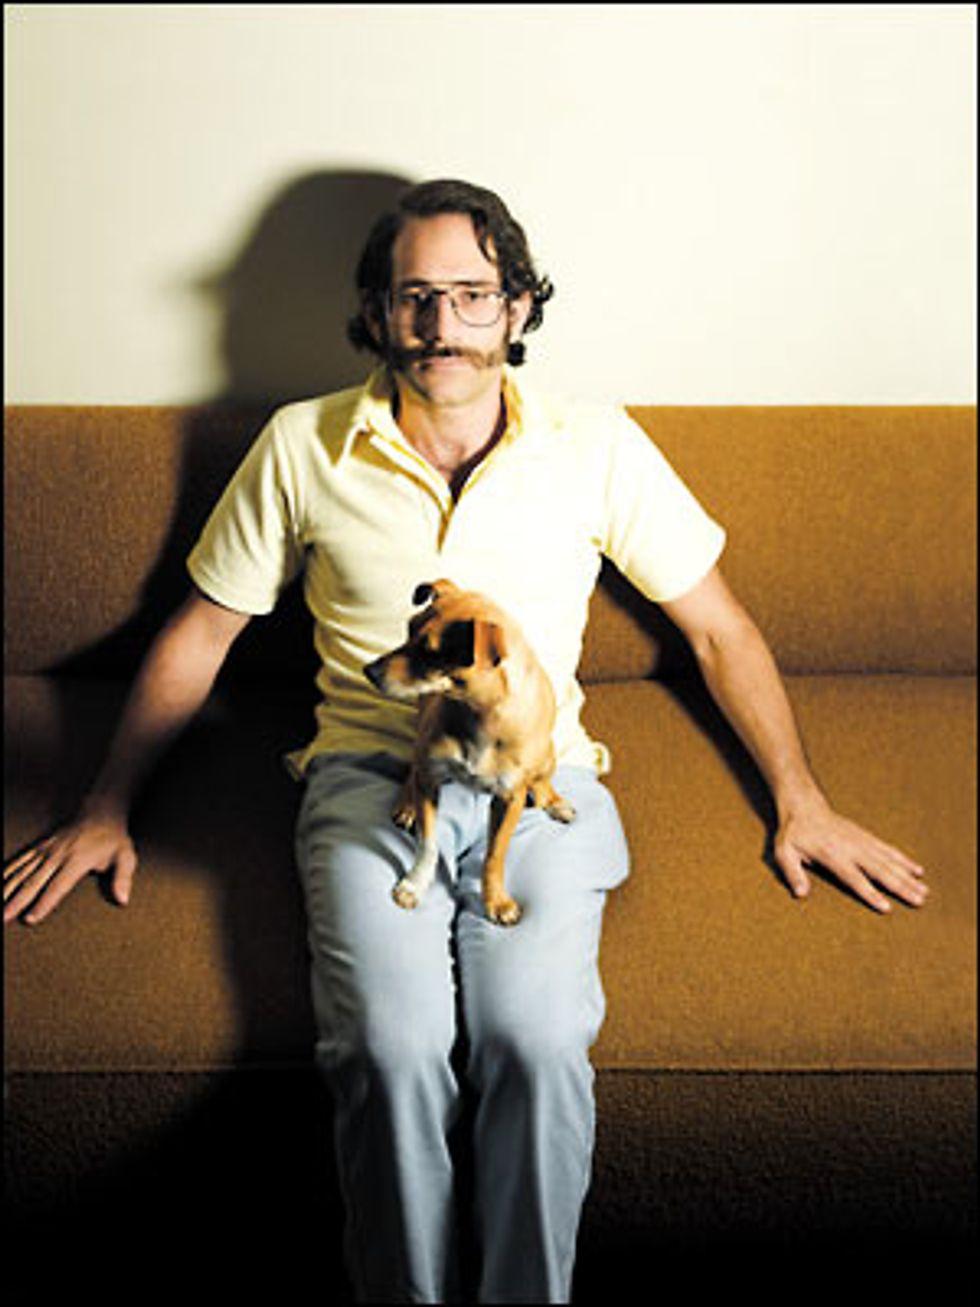 Beautiful People 2004: Dov Charney